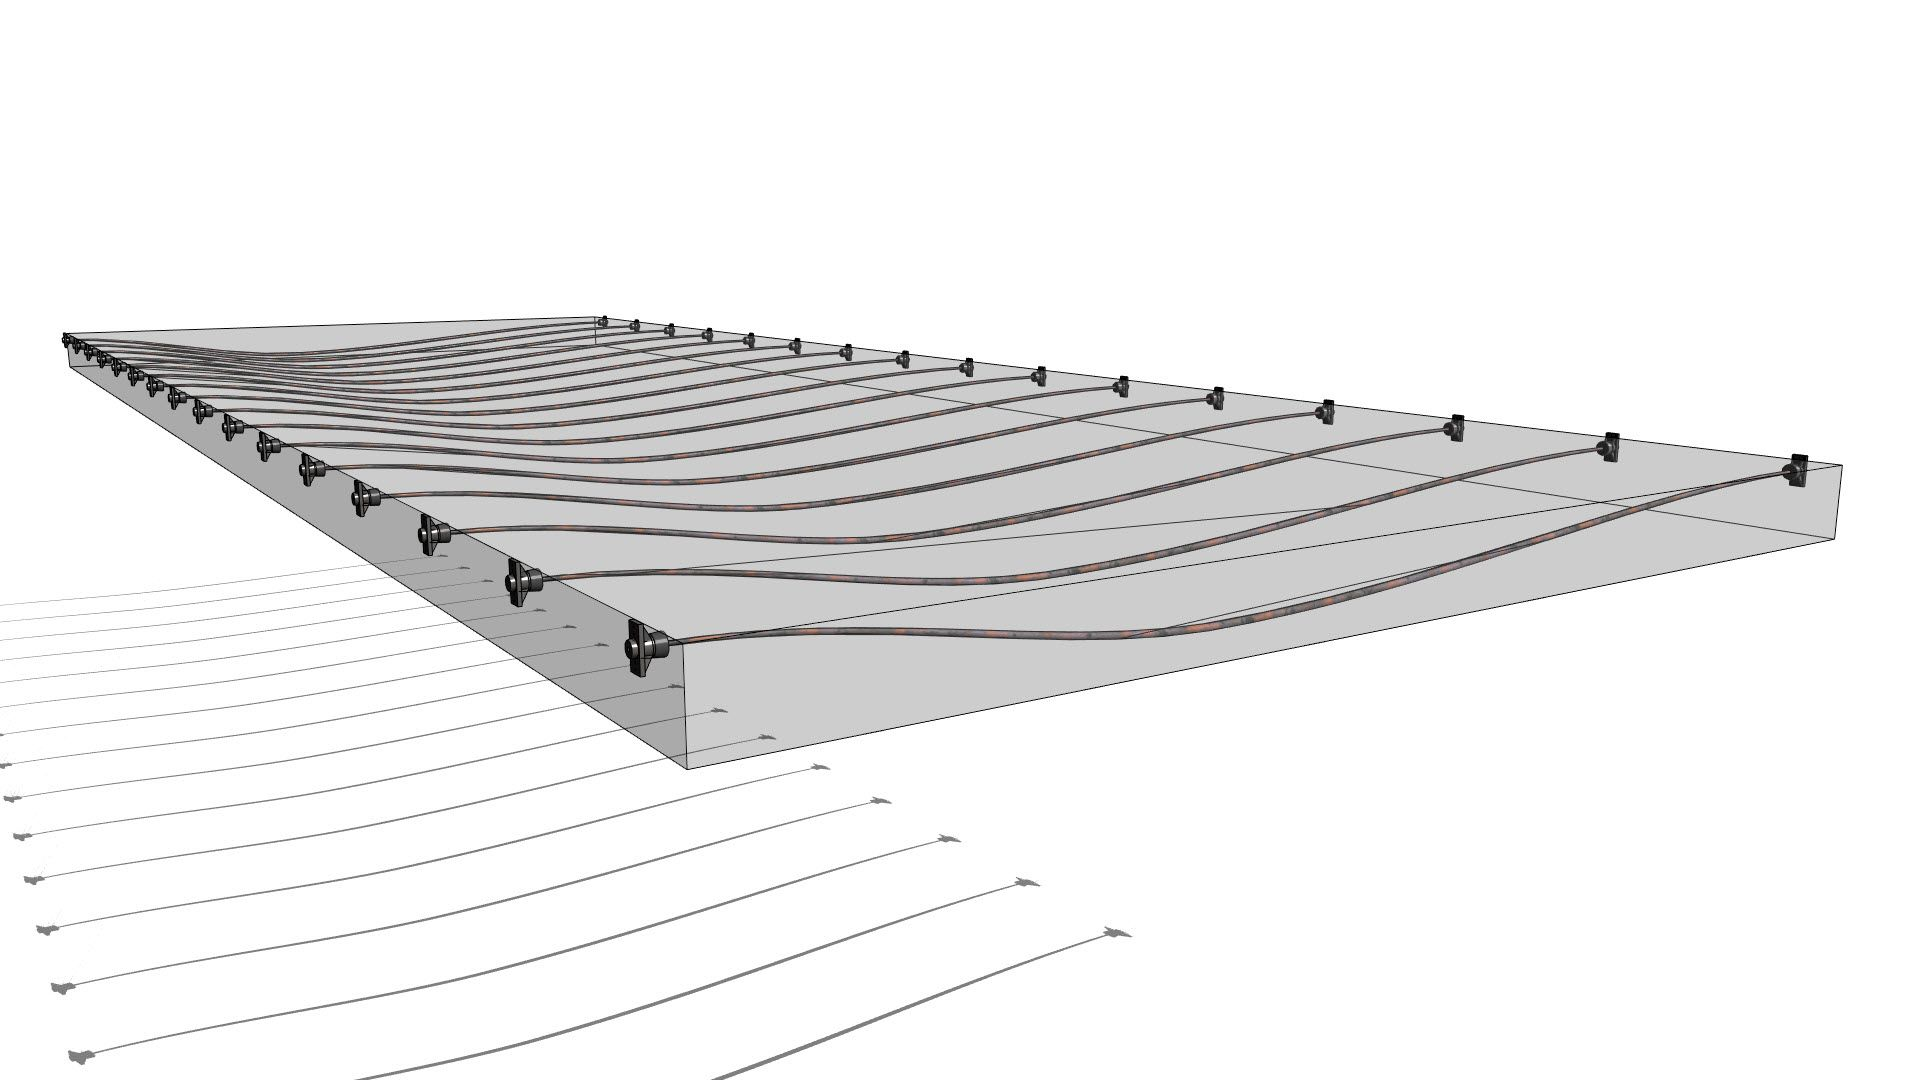 Post Tension Concrete Walls : Post tension structures in revit lt pinterest